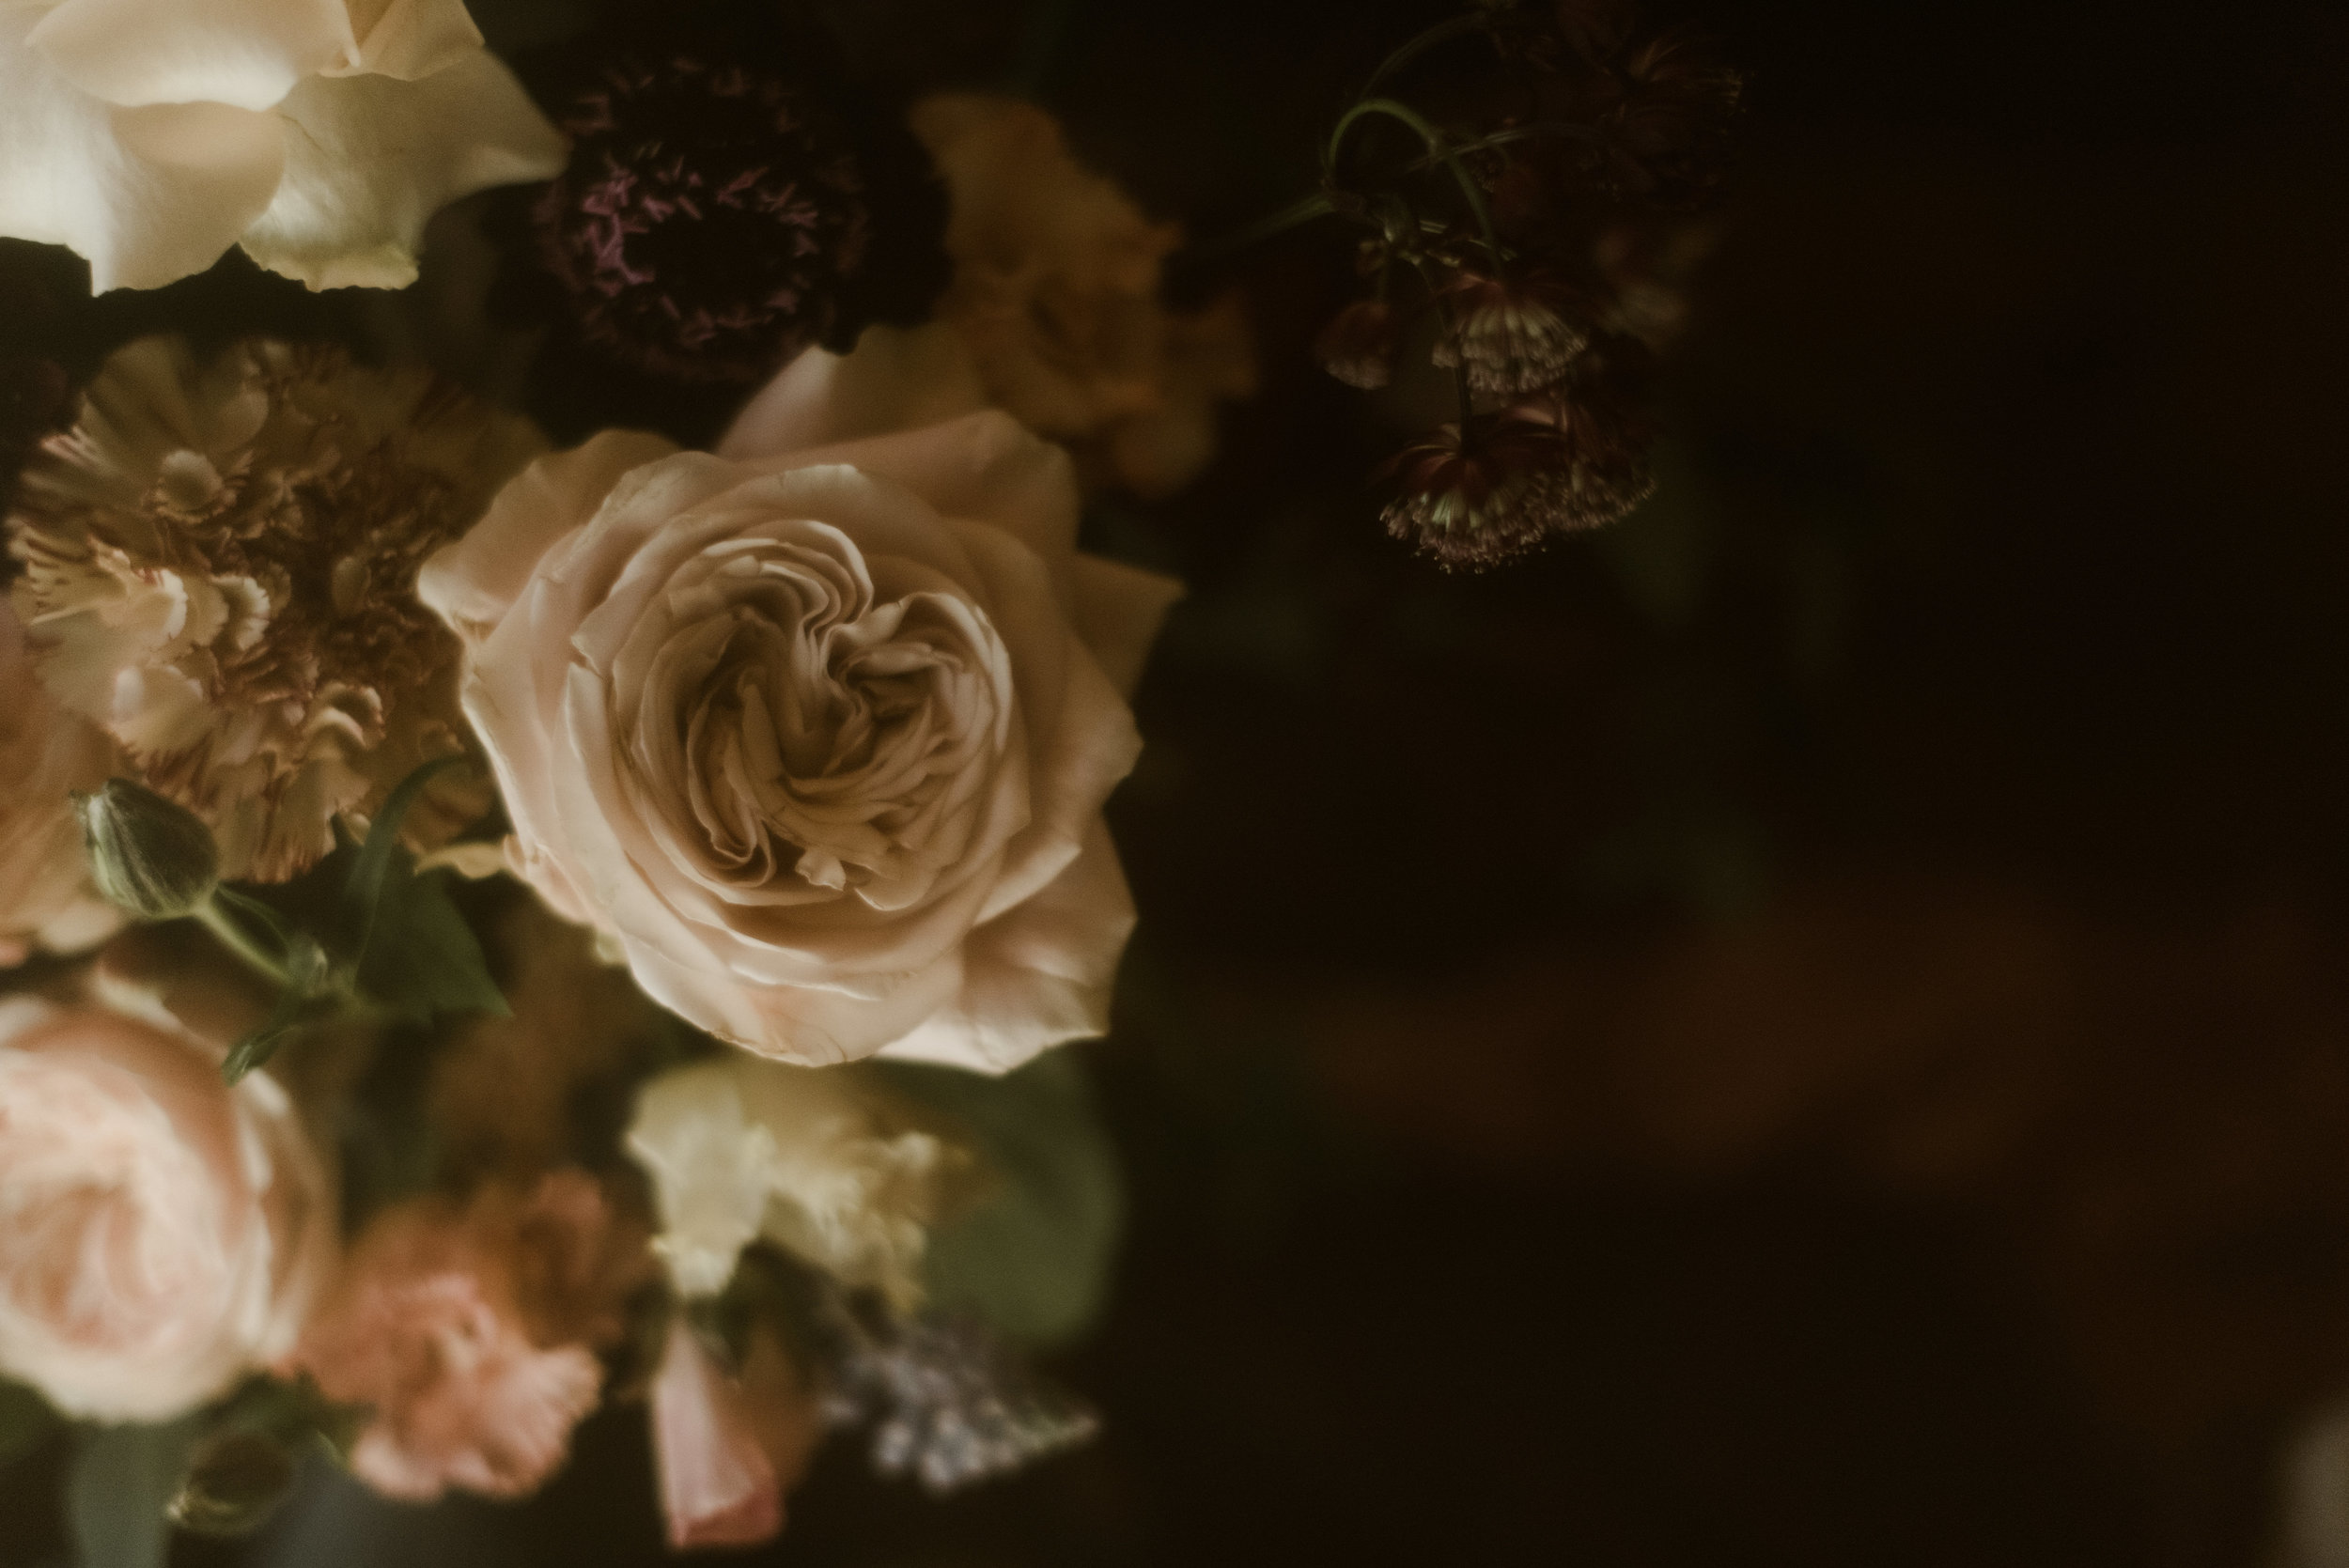 DarkRomance-GHphoto-8.jpg